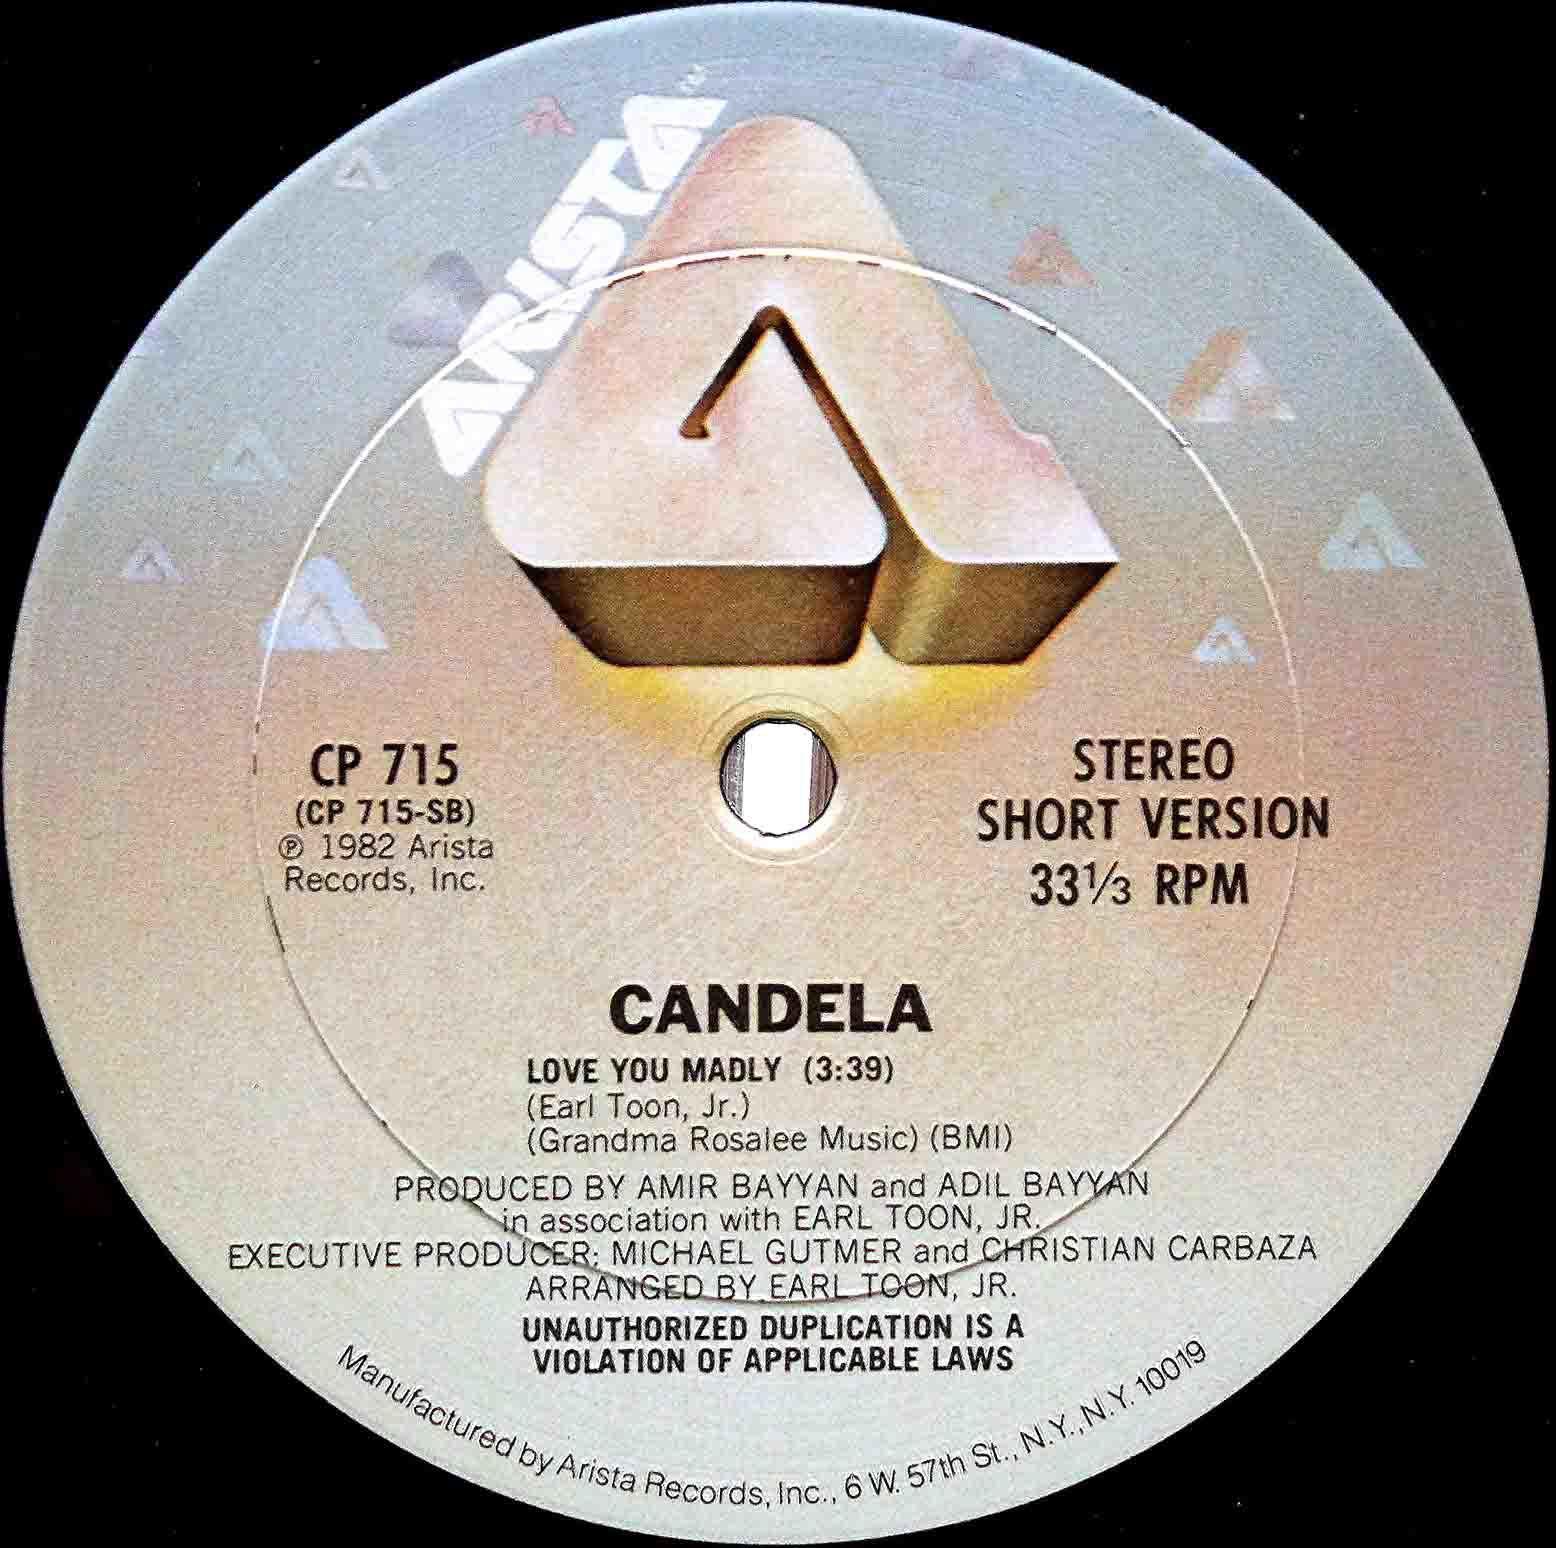 Candela - Love You Madly 03